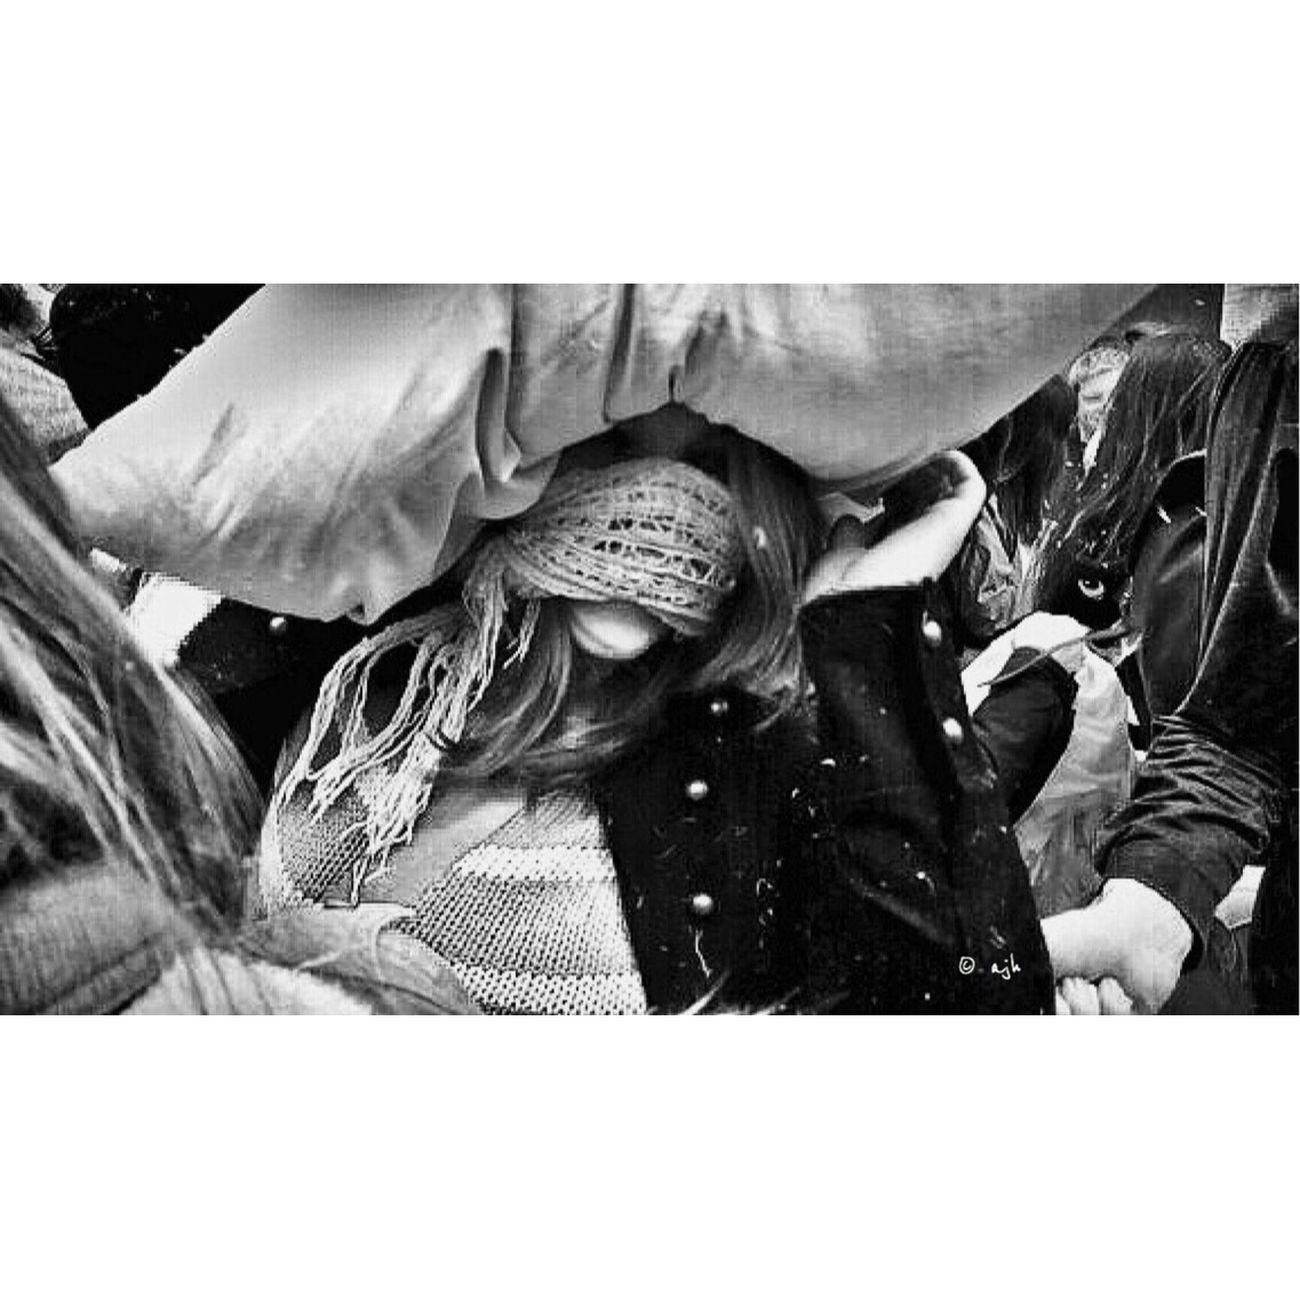 Pillowfightday EyeEm Best Shots Street Portrait The Human Condition AMPt - Street NEM Black&white Streetphotography_bw EyeEm Best Shots - Black + White NEM Street Black & White